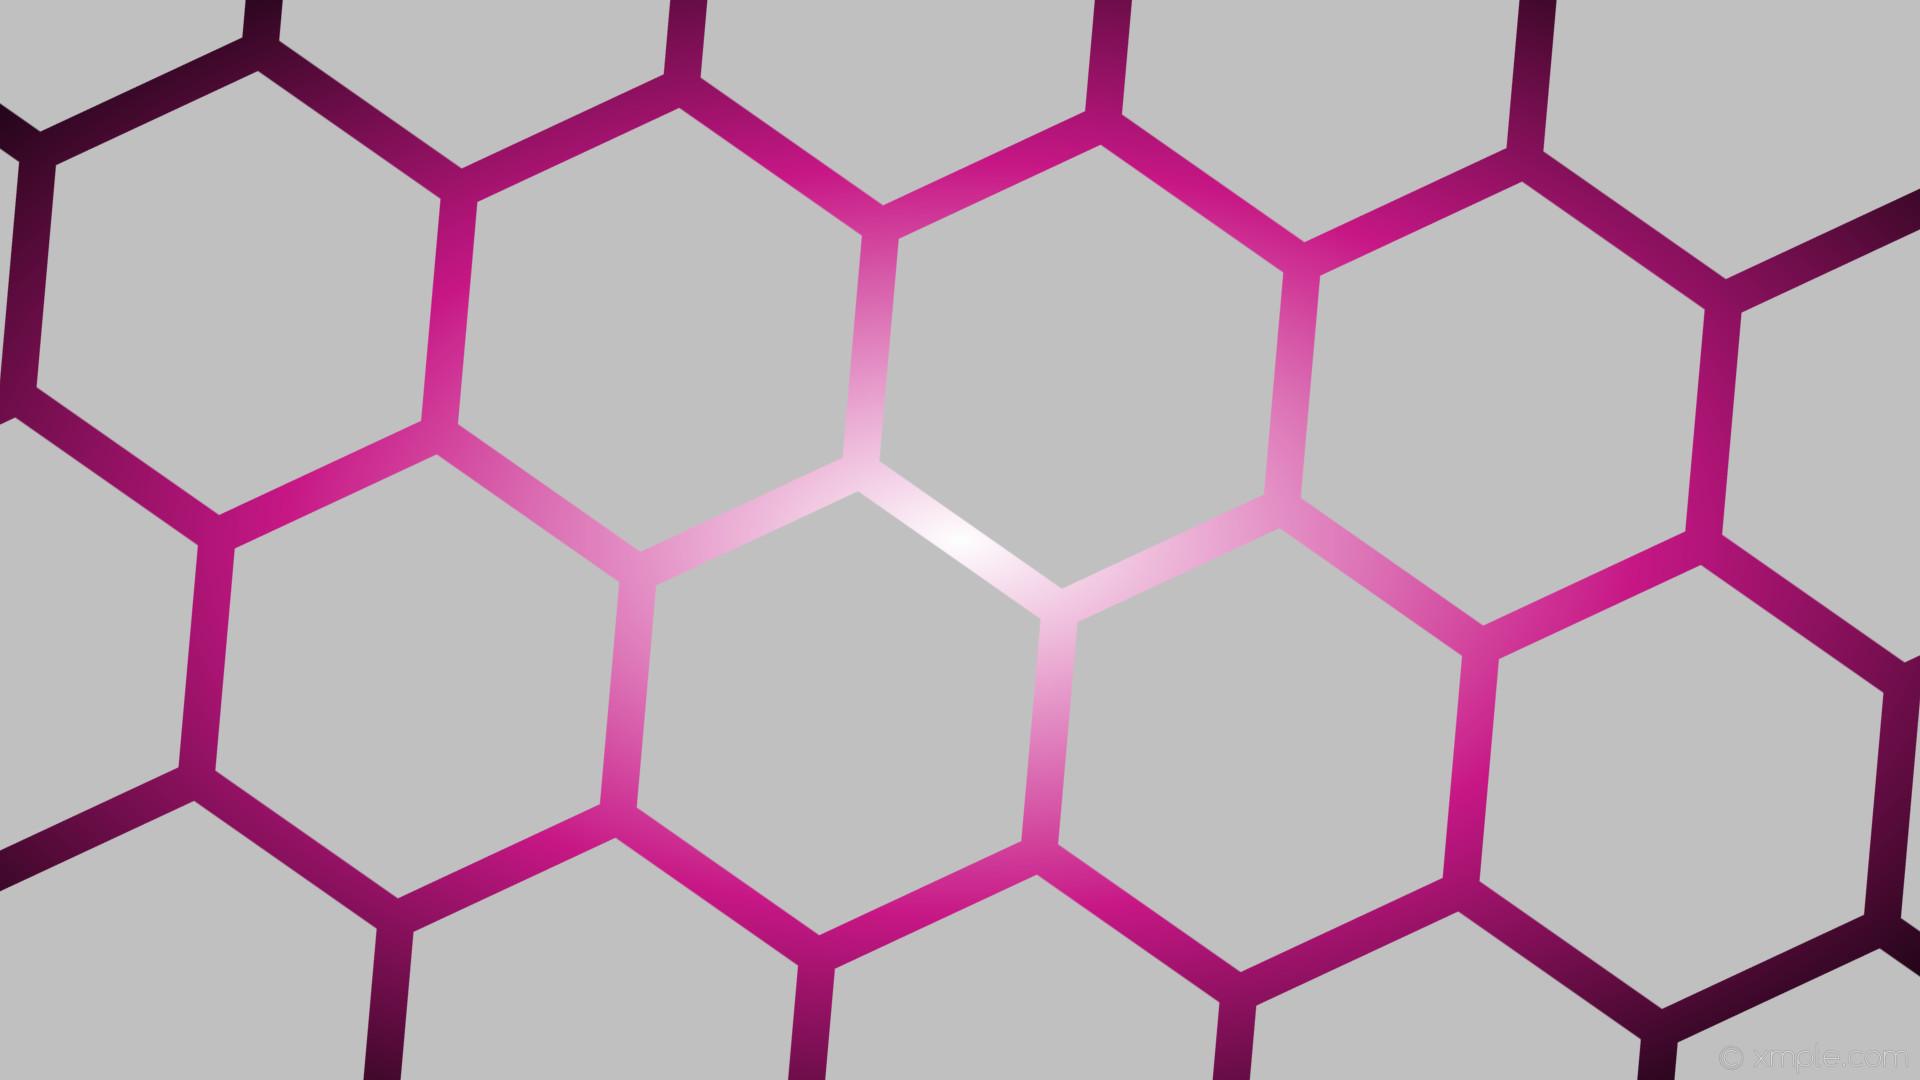 wallpaper pink glow black grey white gradient hexagon silver medium violet  red #c0c0c0 #ffffff